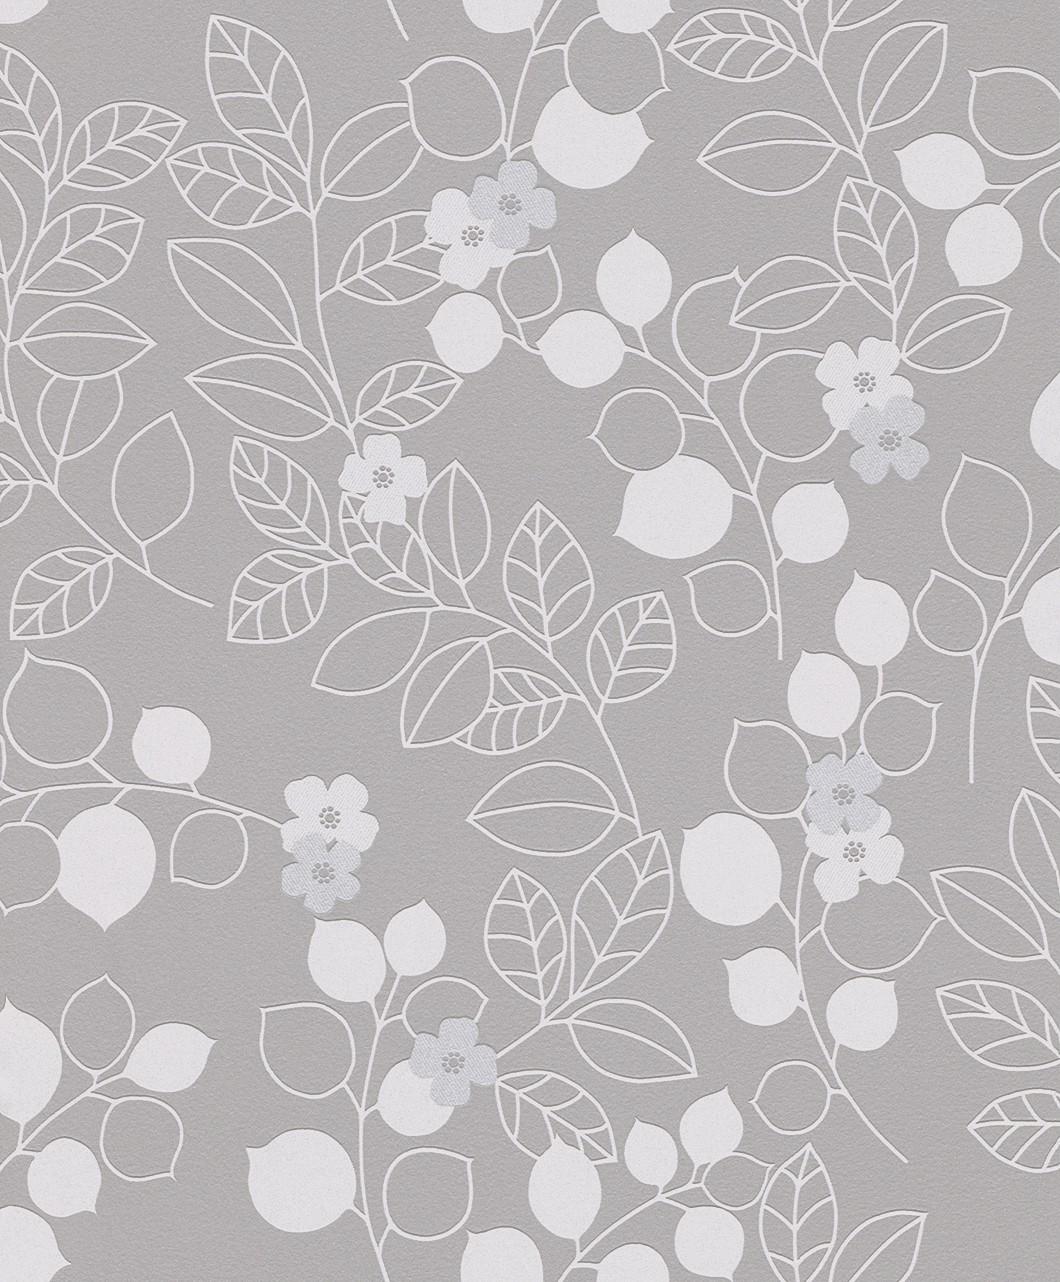 tapete wei grau rosa amped for. Black Bedroom Furniture Sets. Home Design Ideas